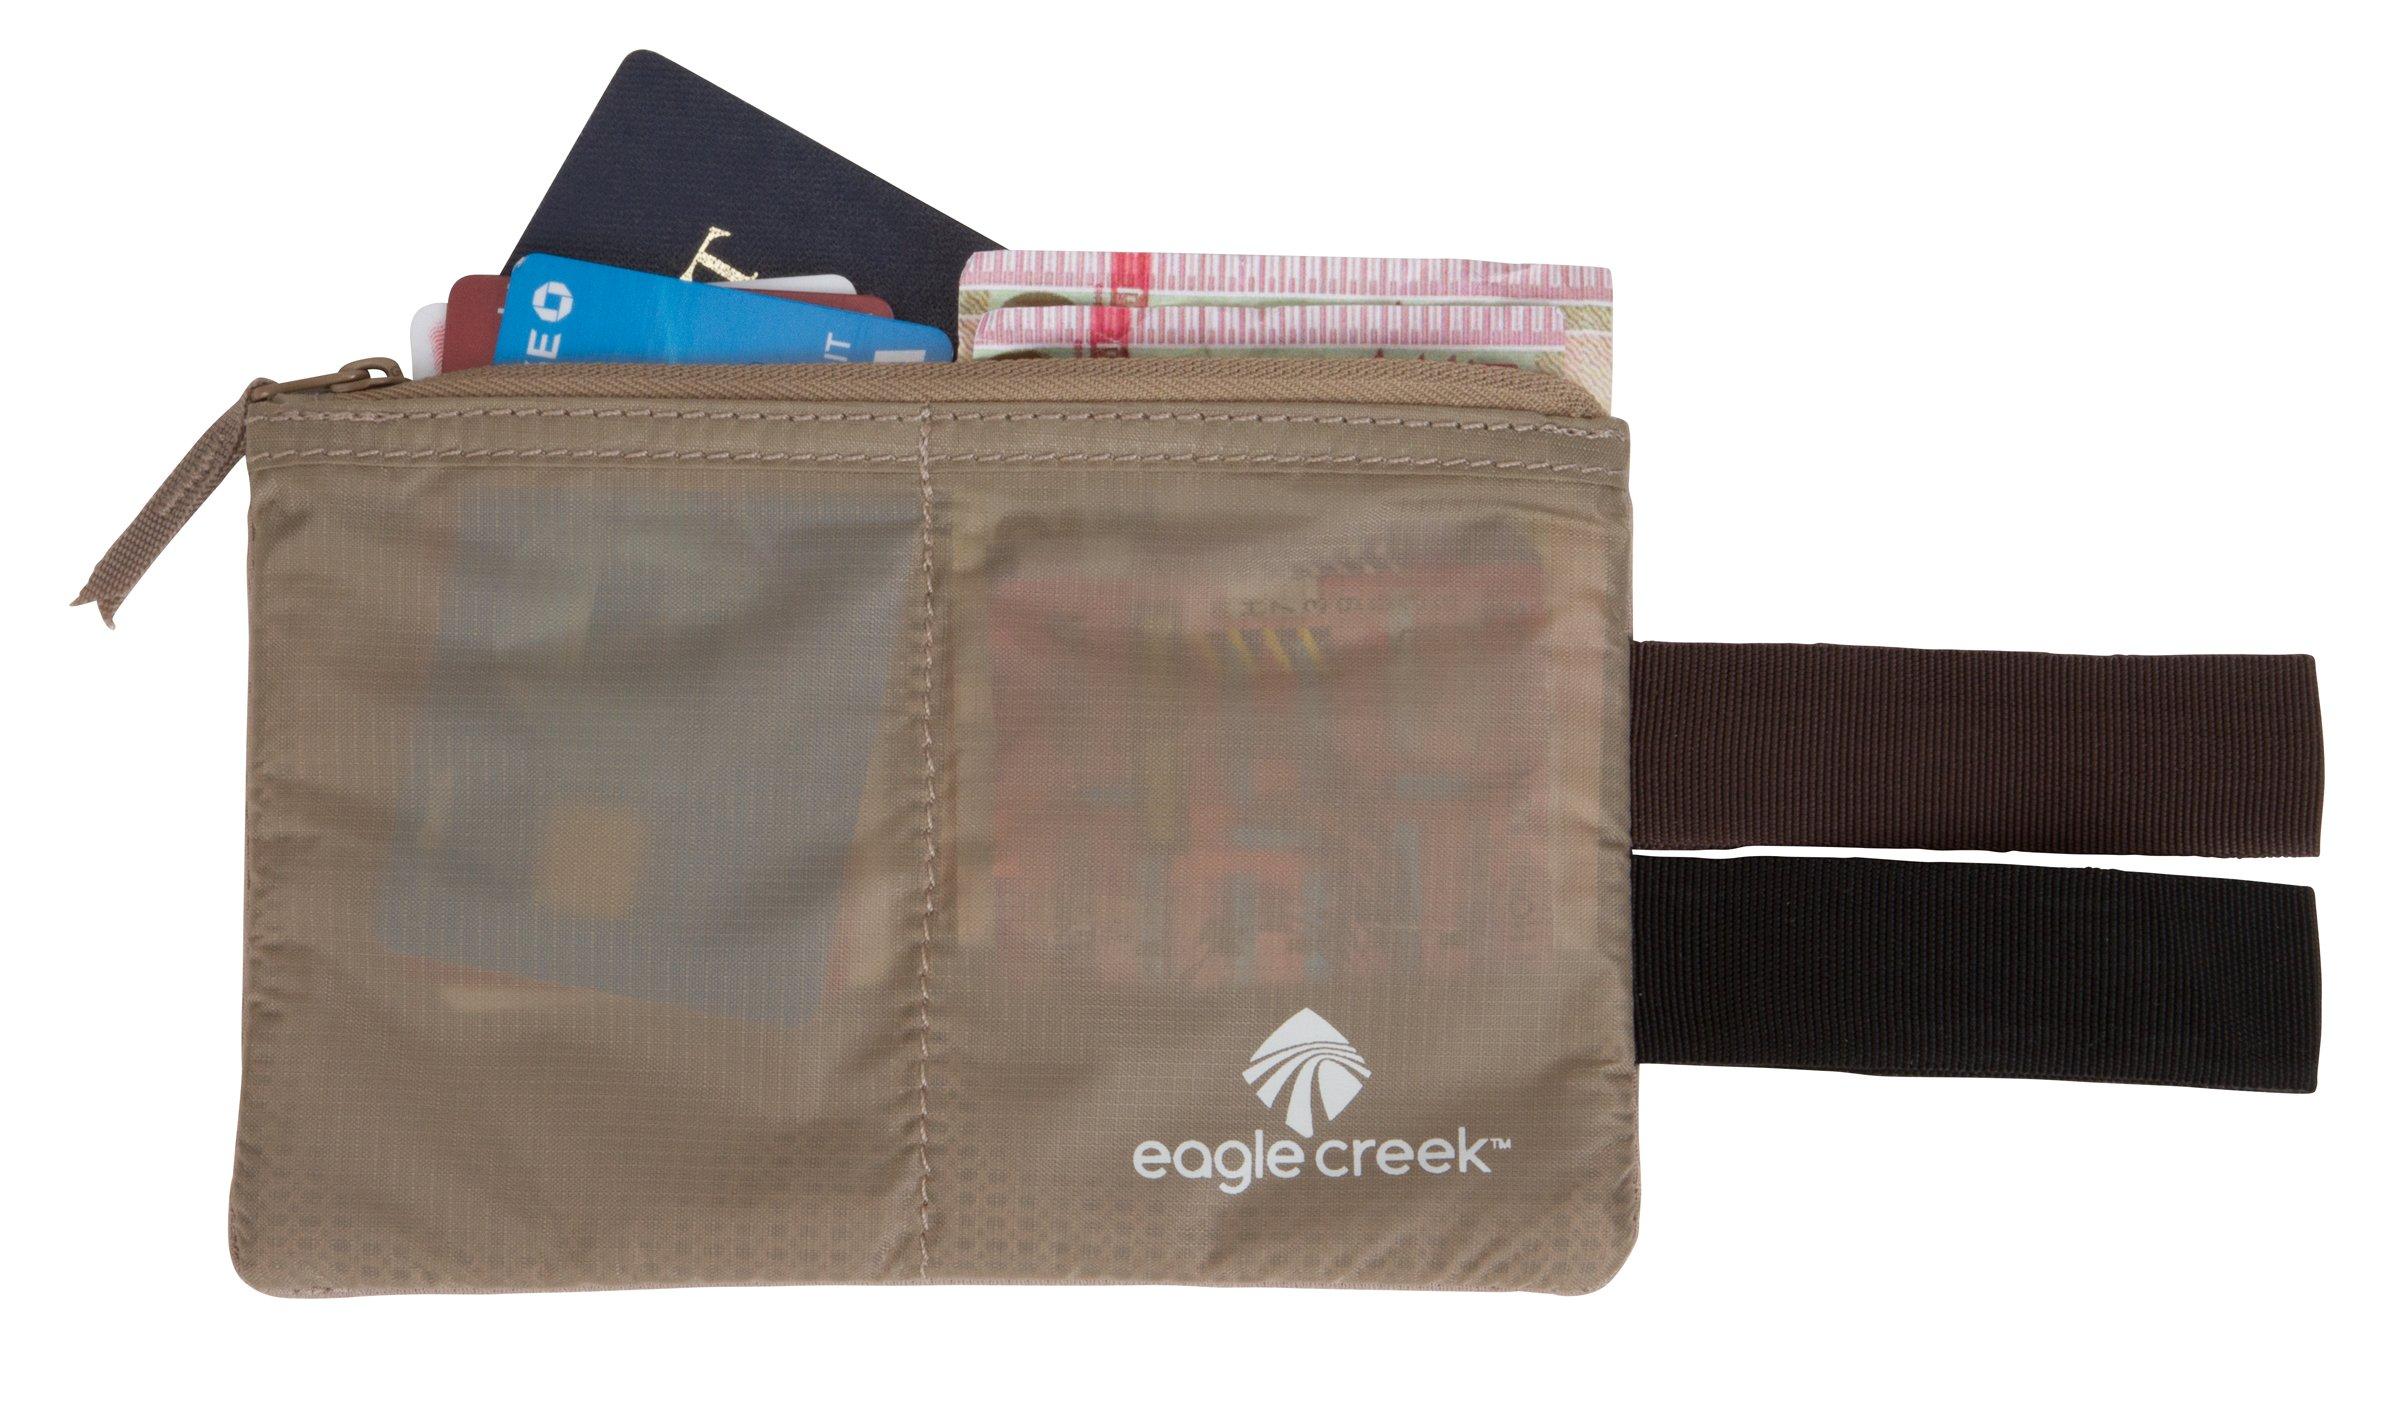 Eagle creek travel gear undercover hidden pocket khaki amazon for Travel gear hidden pocket